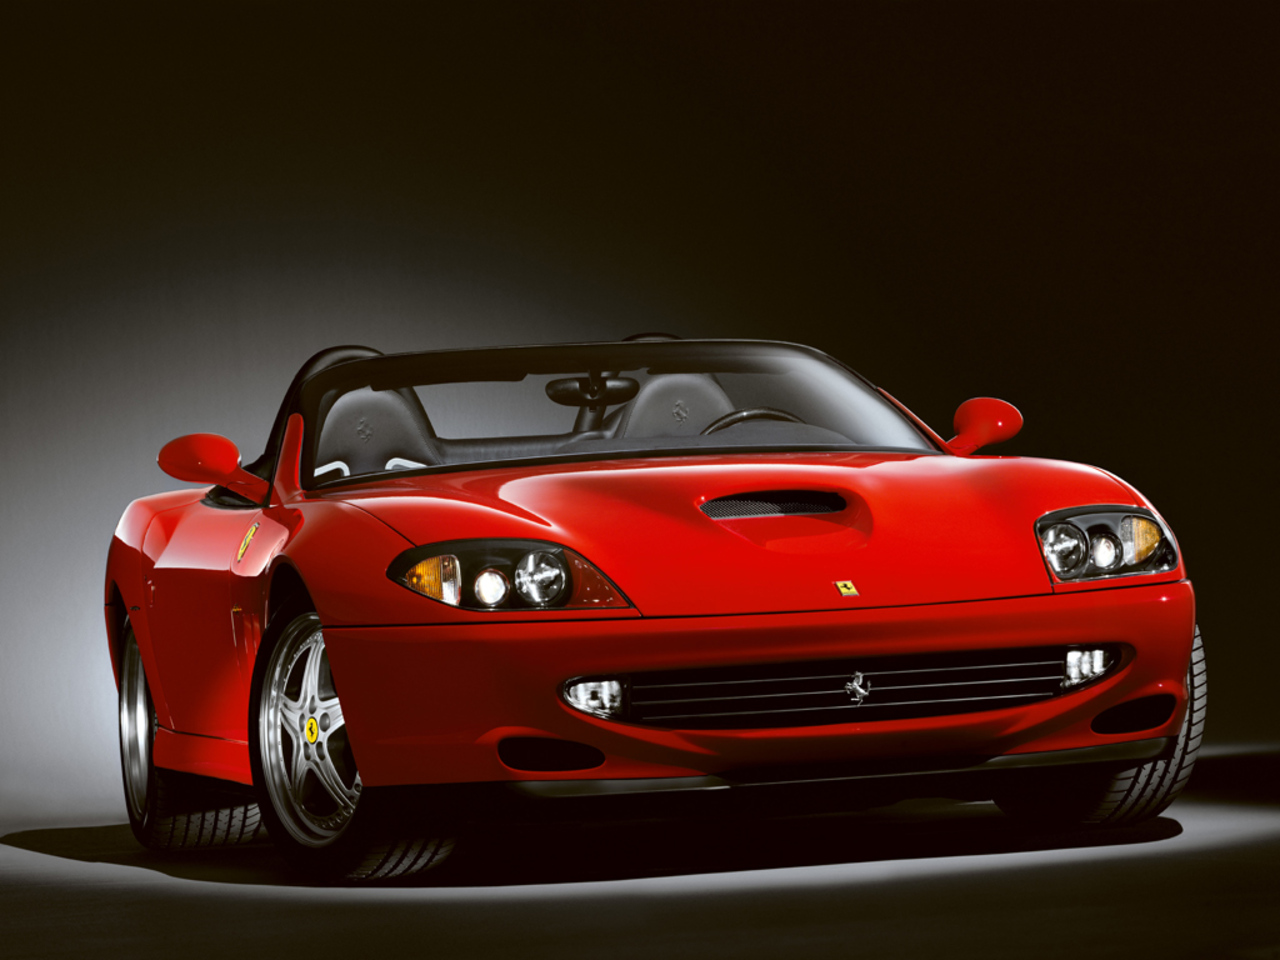 550 Barchetta Pininfarina: 3/4 front view